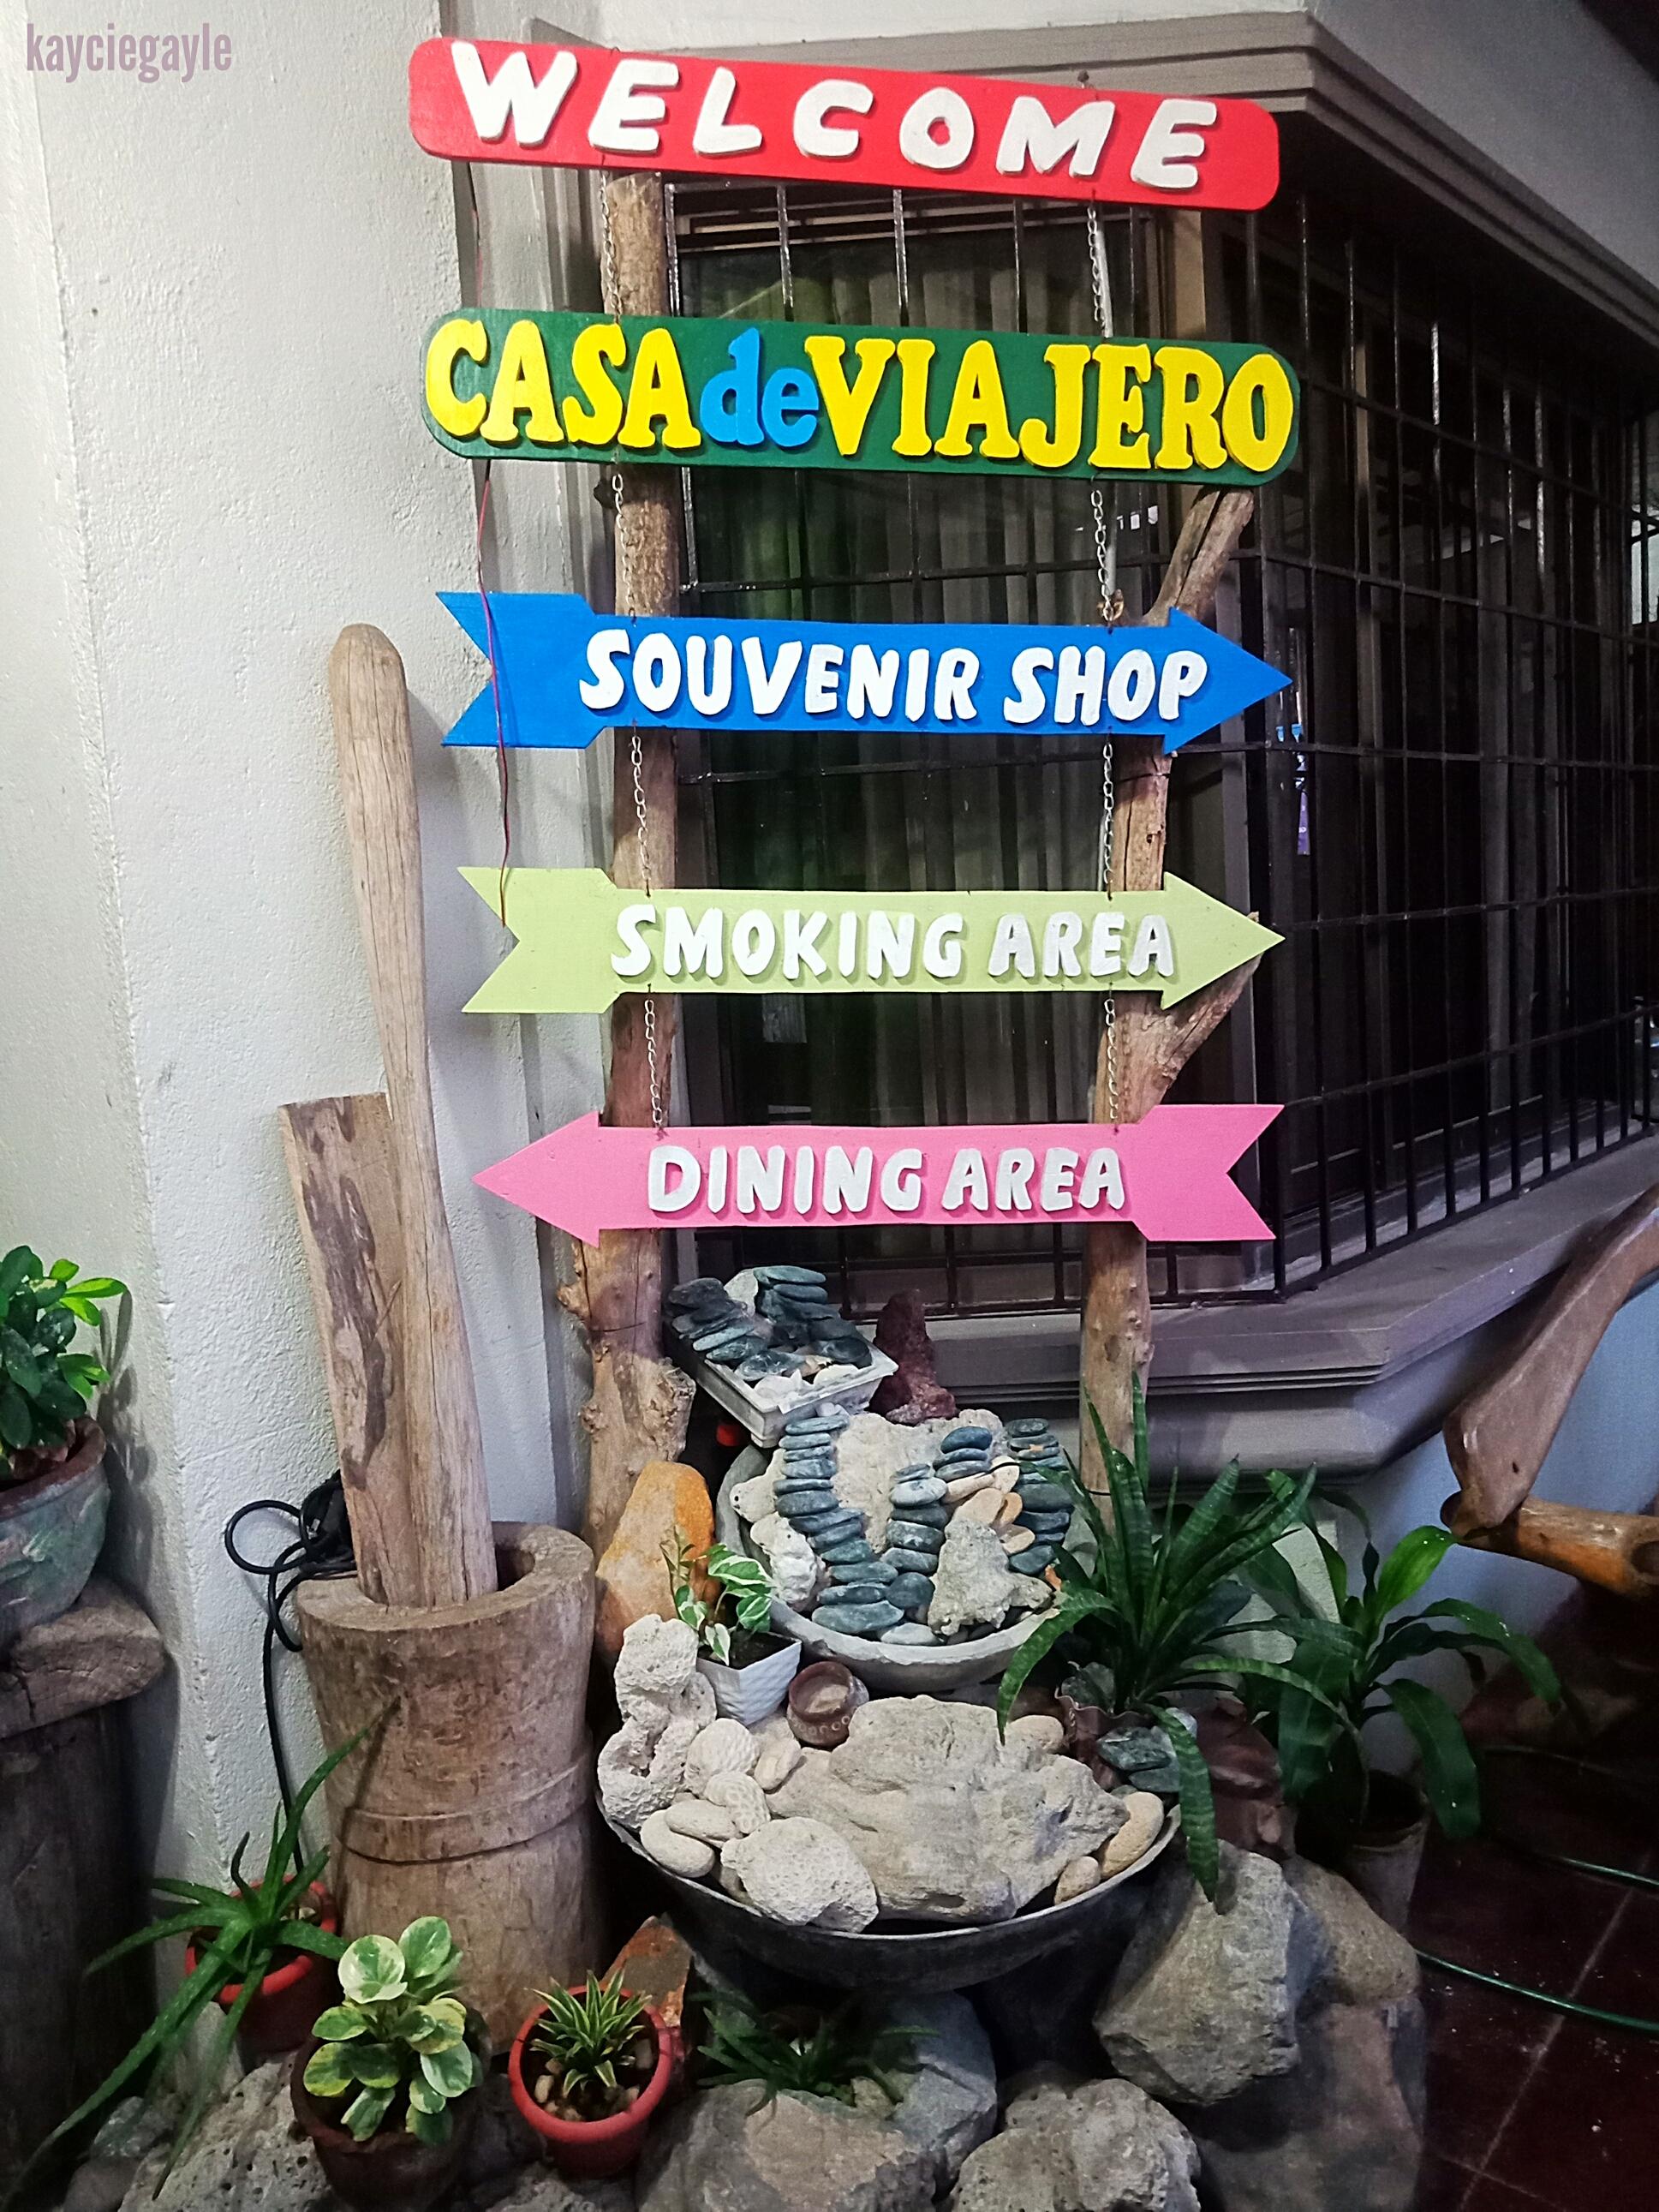 Casa de Viajero Tourist Inn Signpost